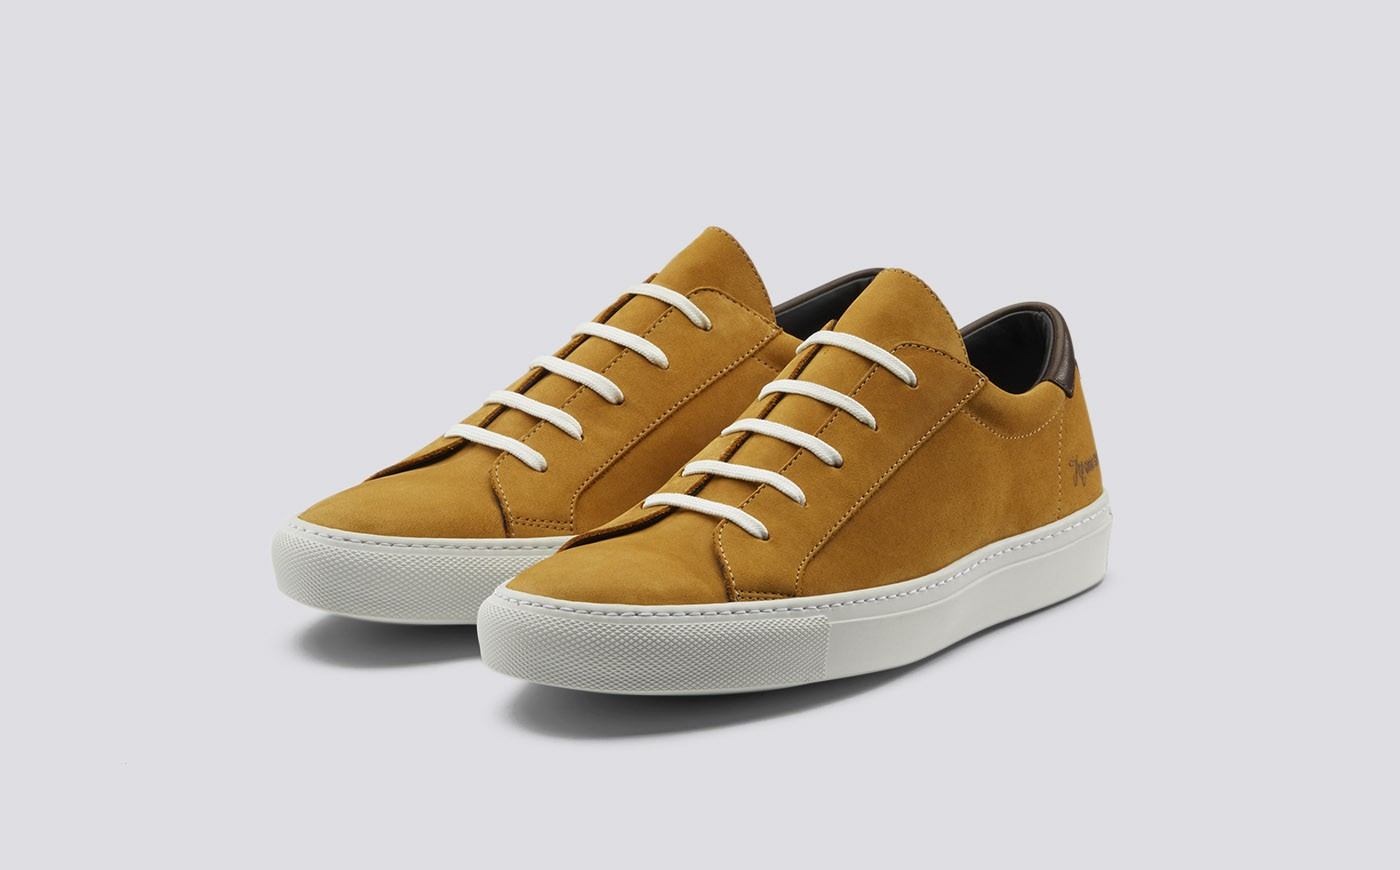 Grenson Beige Suede Sneakers